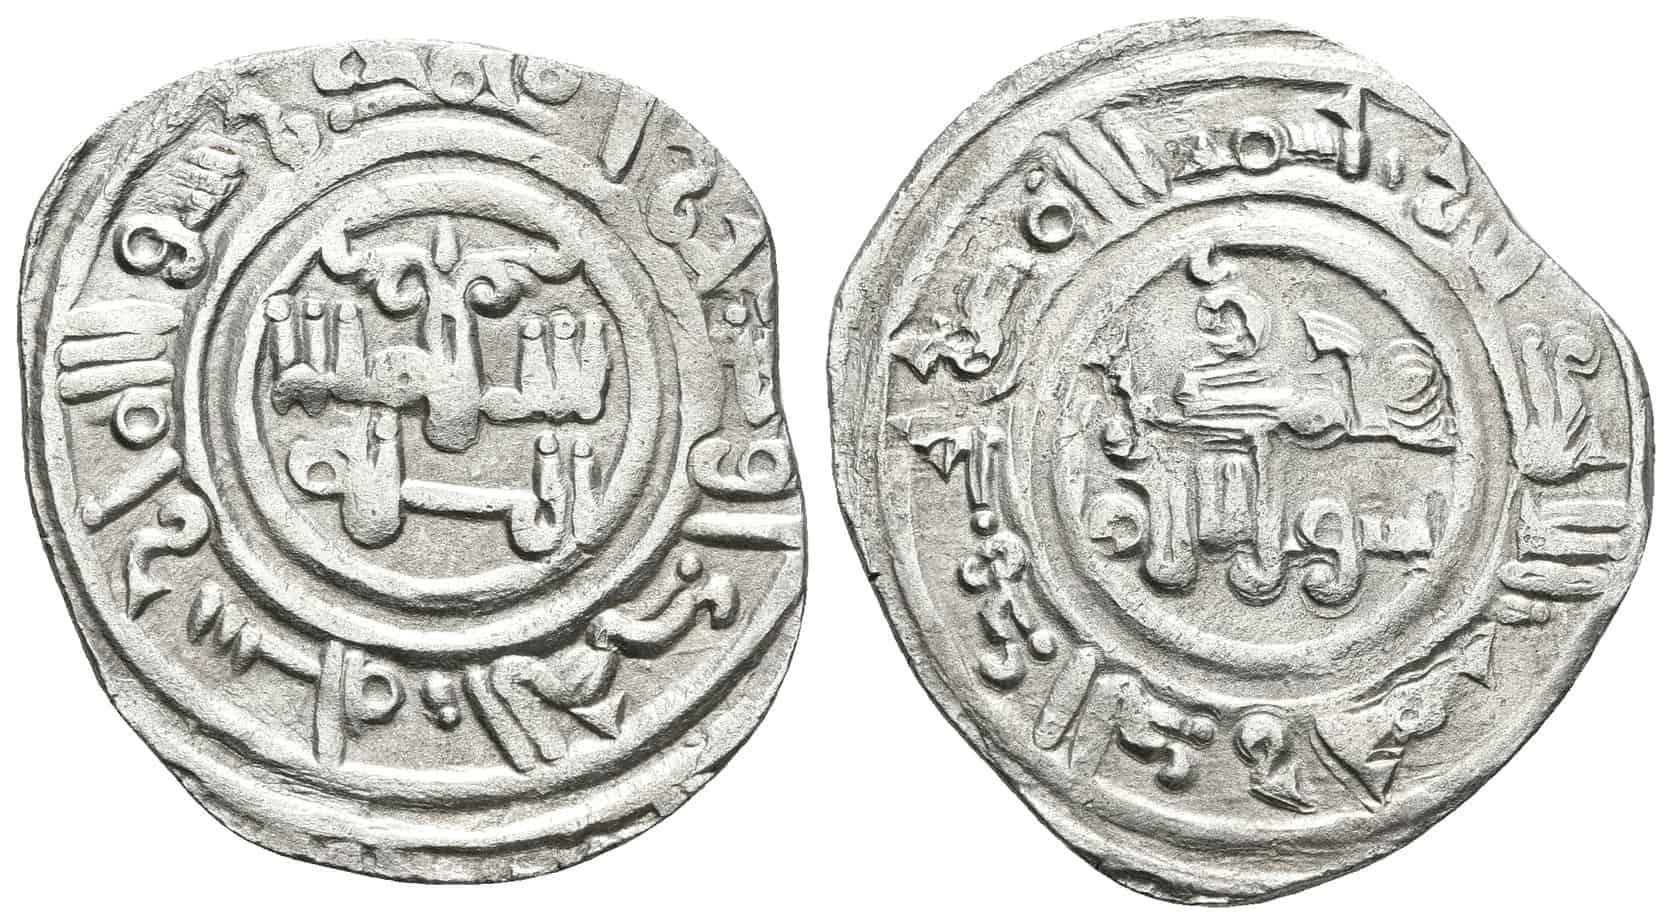 Dirham de Maan Ibn Sumadih (Banu Sumadih), Taifa de Almería